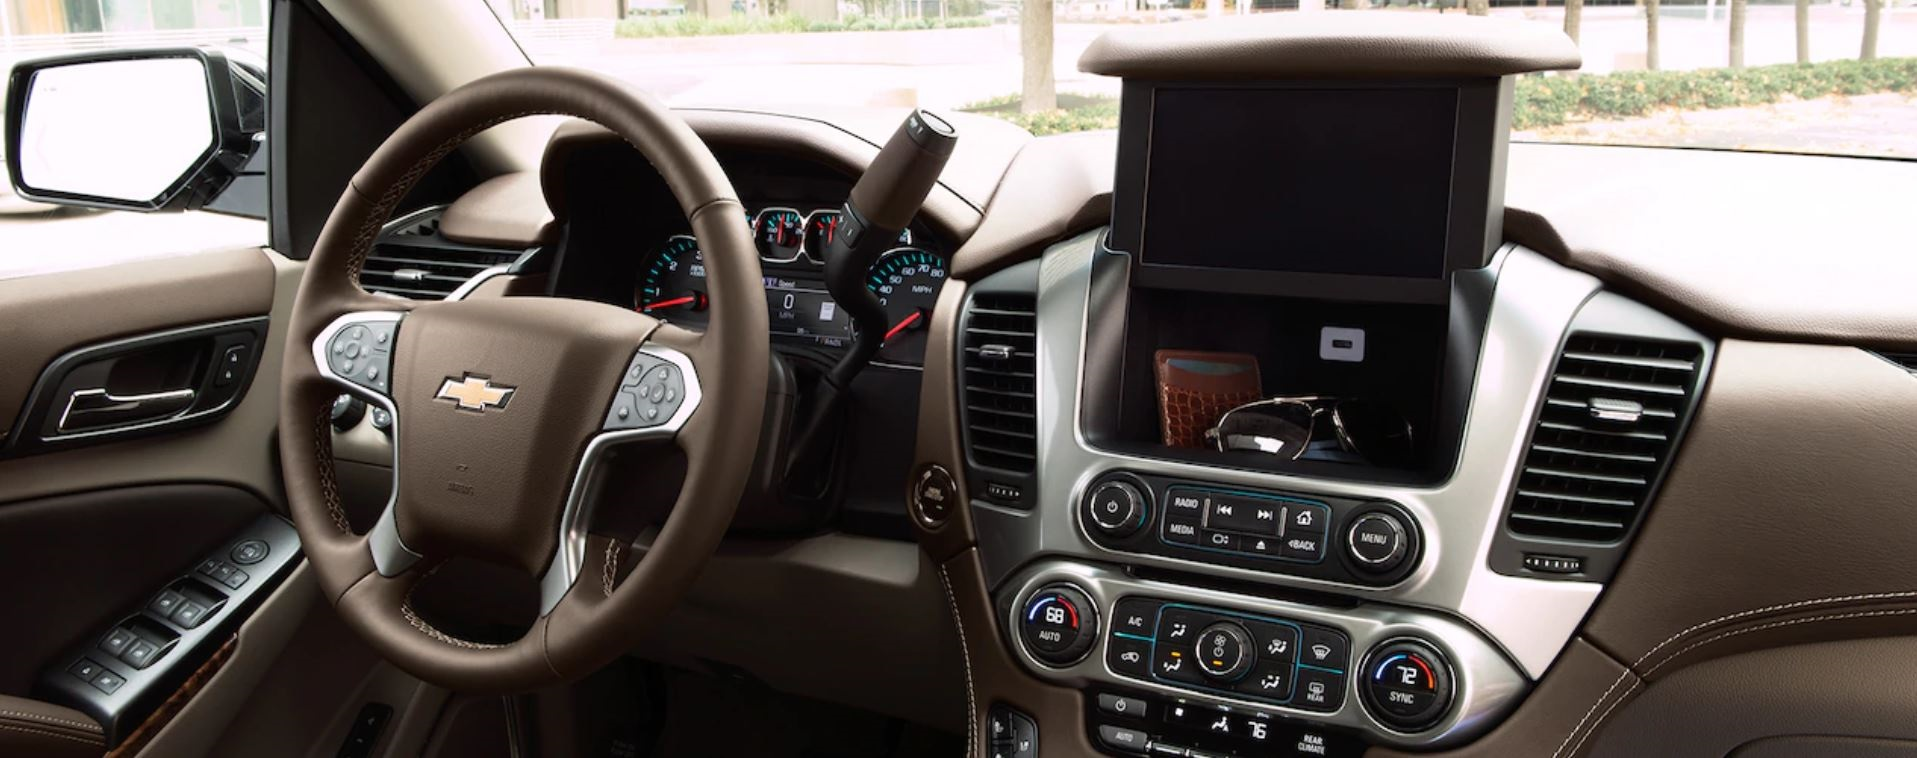 2019 Chevrolet Tahoe Cockpit